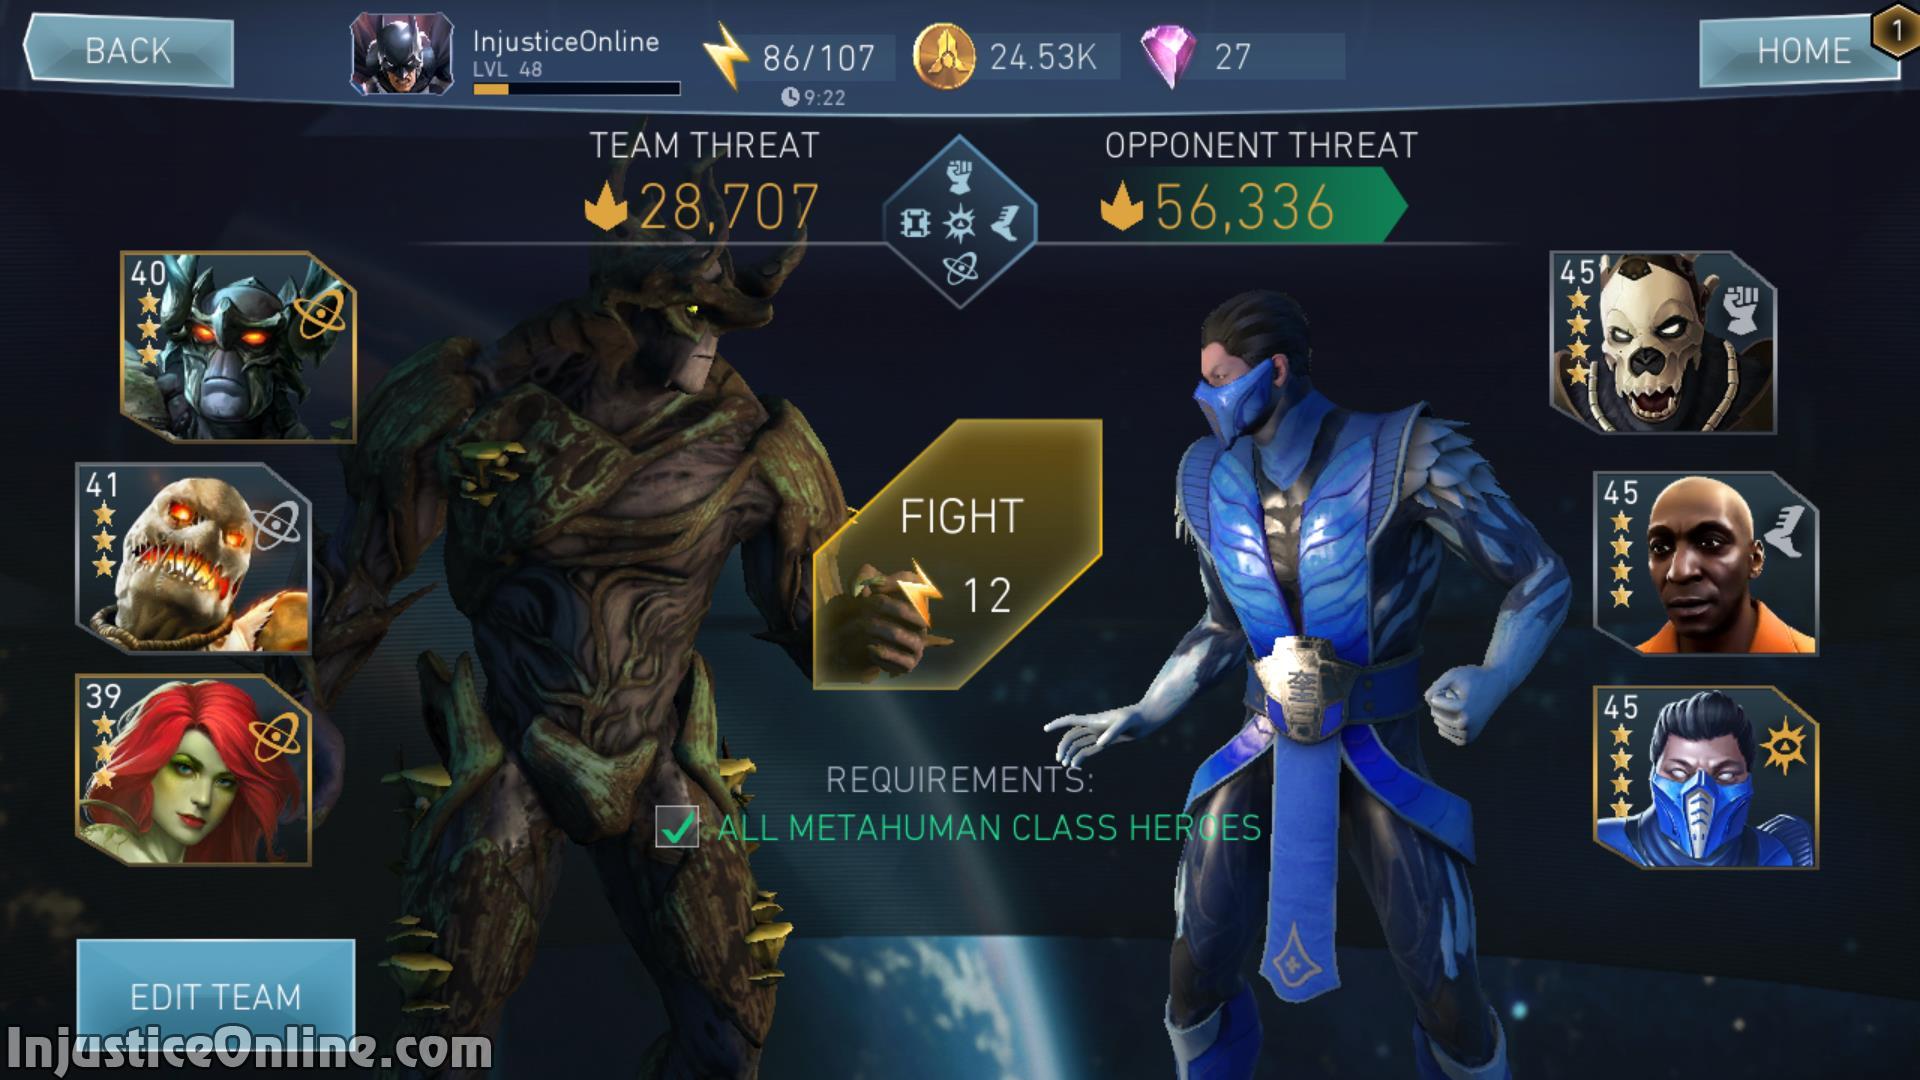 Injustice 2 Mobile Sub Zero Challenge Screenshot 03 Injusticeonline